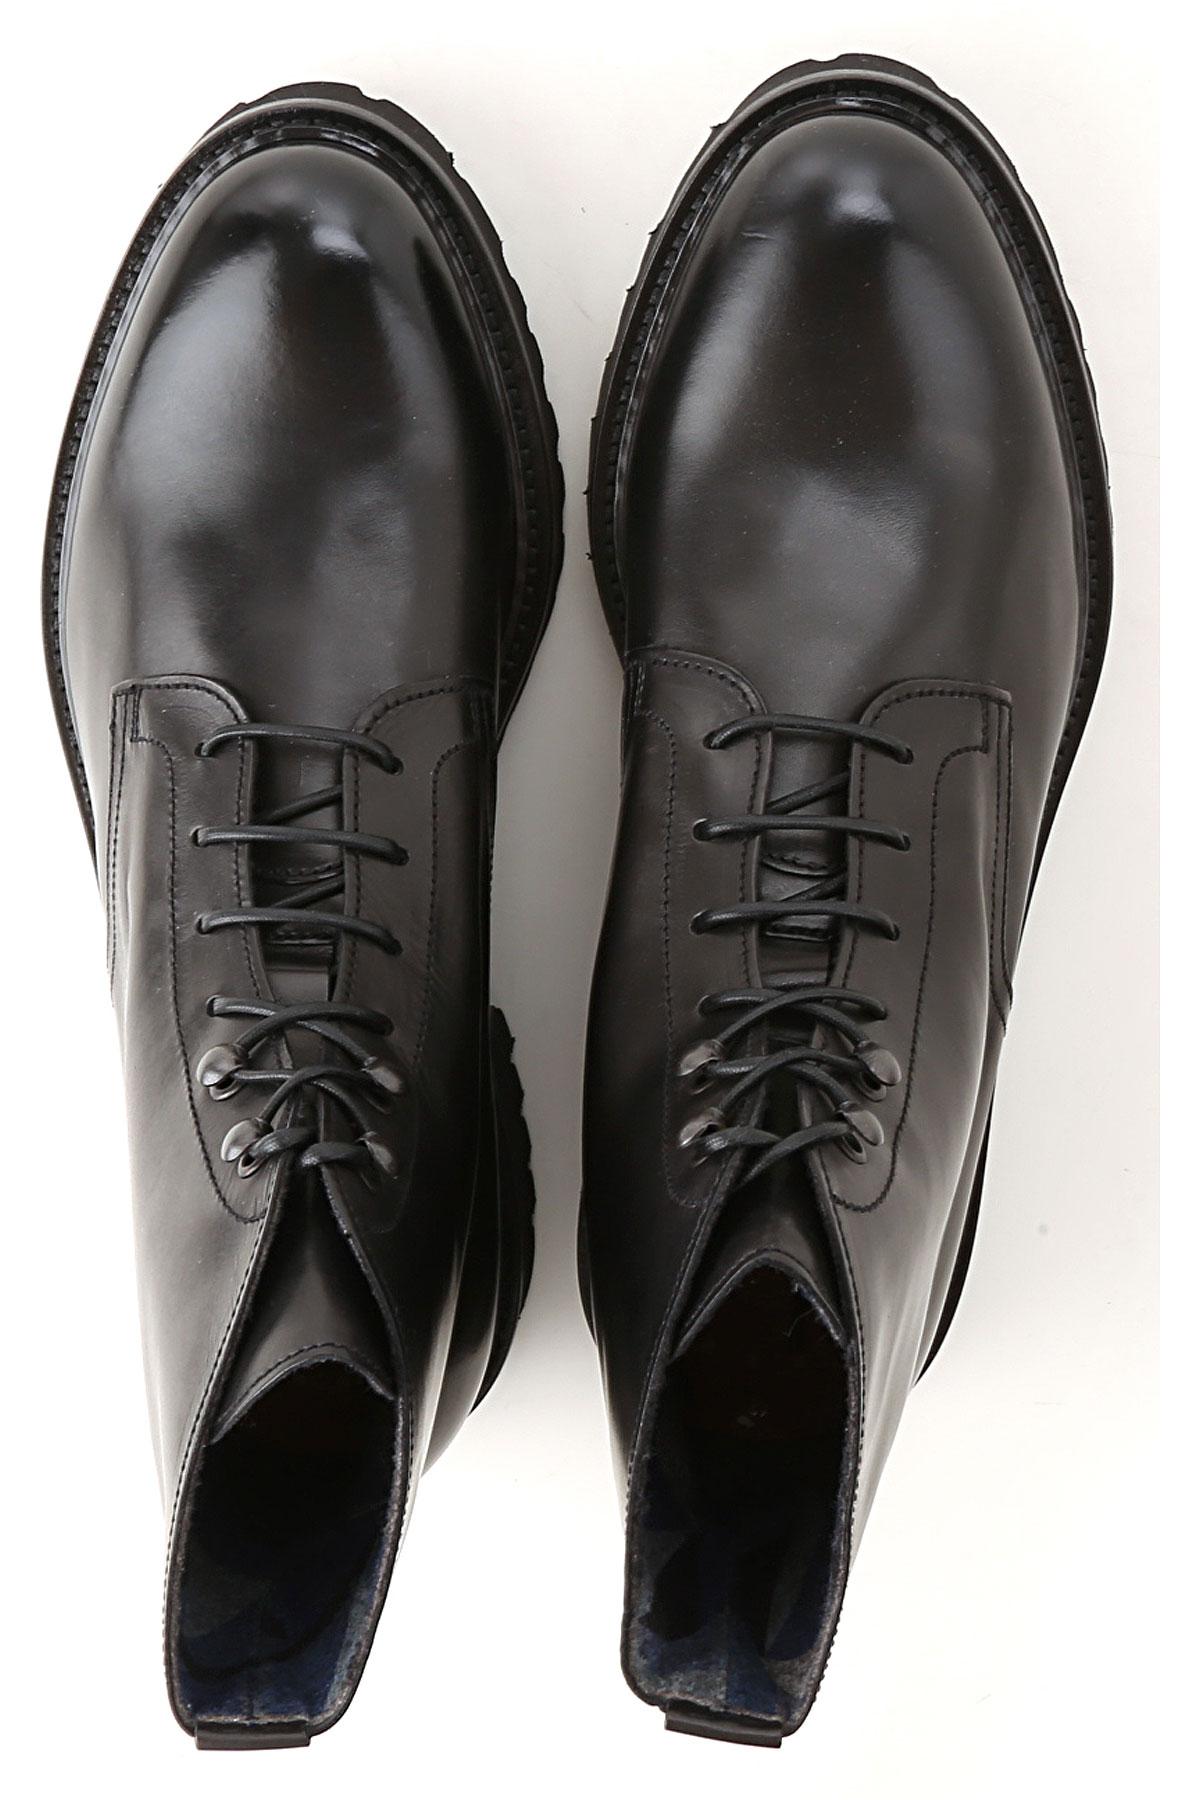 2018 Otoño Para Negro Hombres 19 invierno Zapatos nbsp; Doucals qtXZw